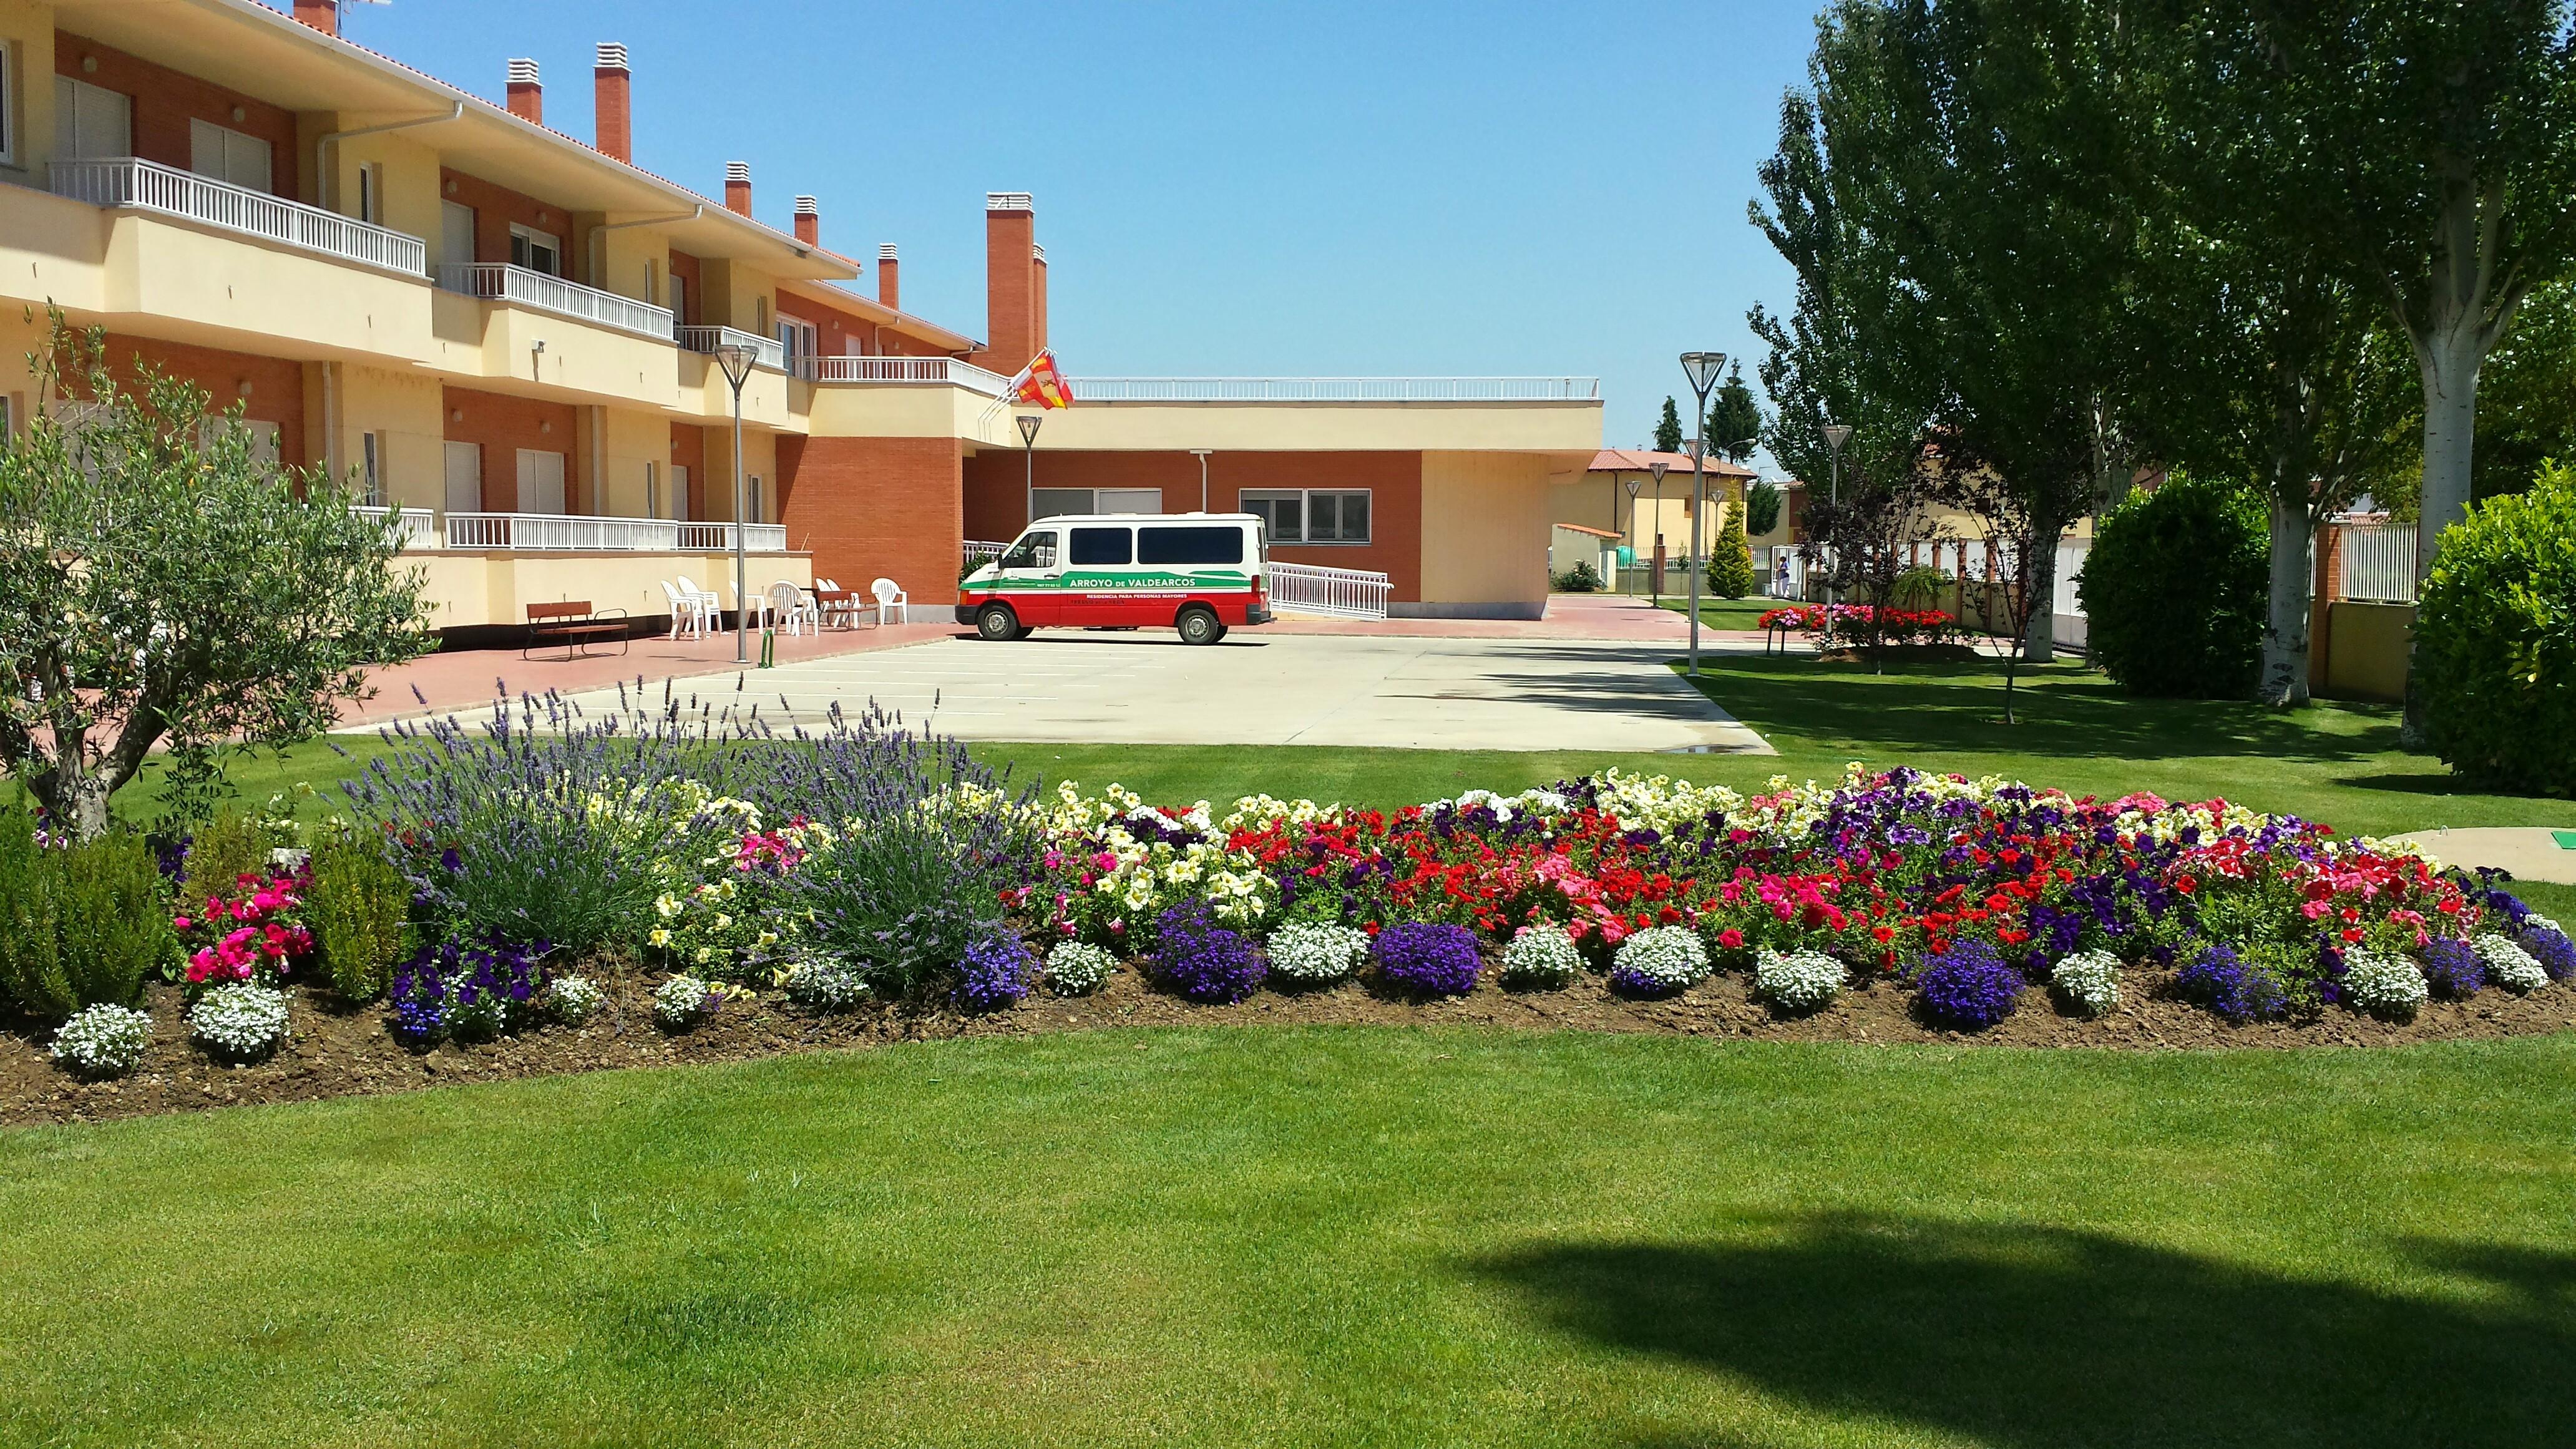 Residencia Geriátrica Arroyo de Valdearcos